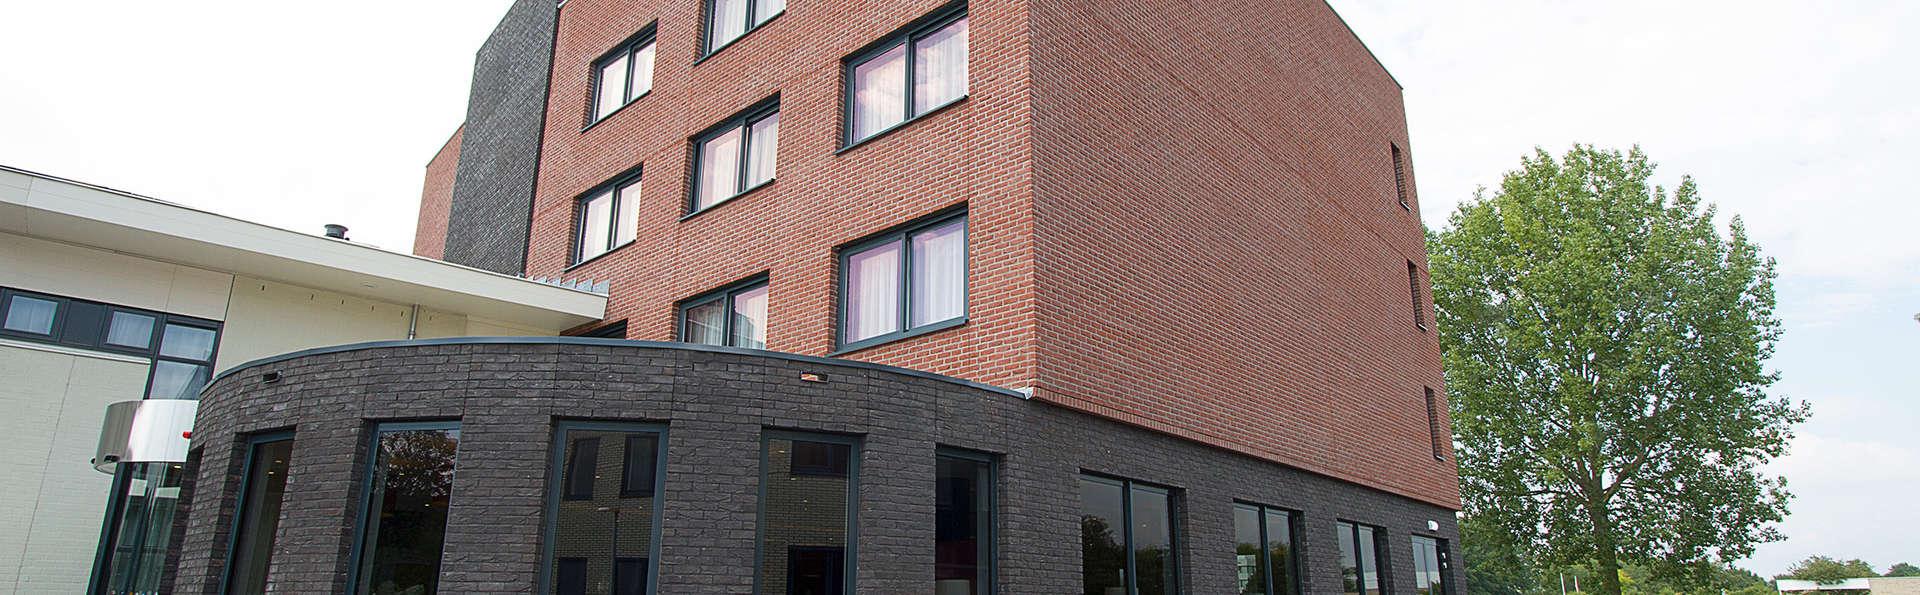 Bastion Hotel Leeuwarden - Edit_Front.jpg